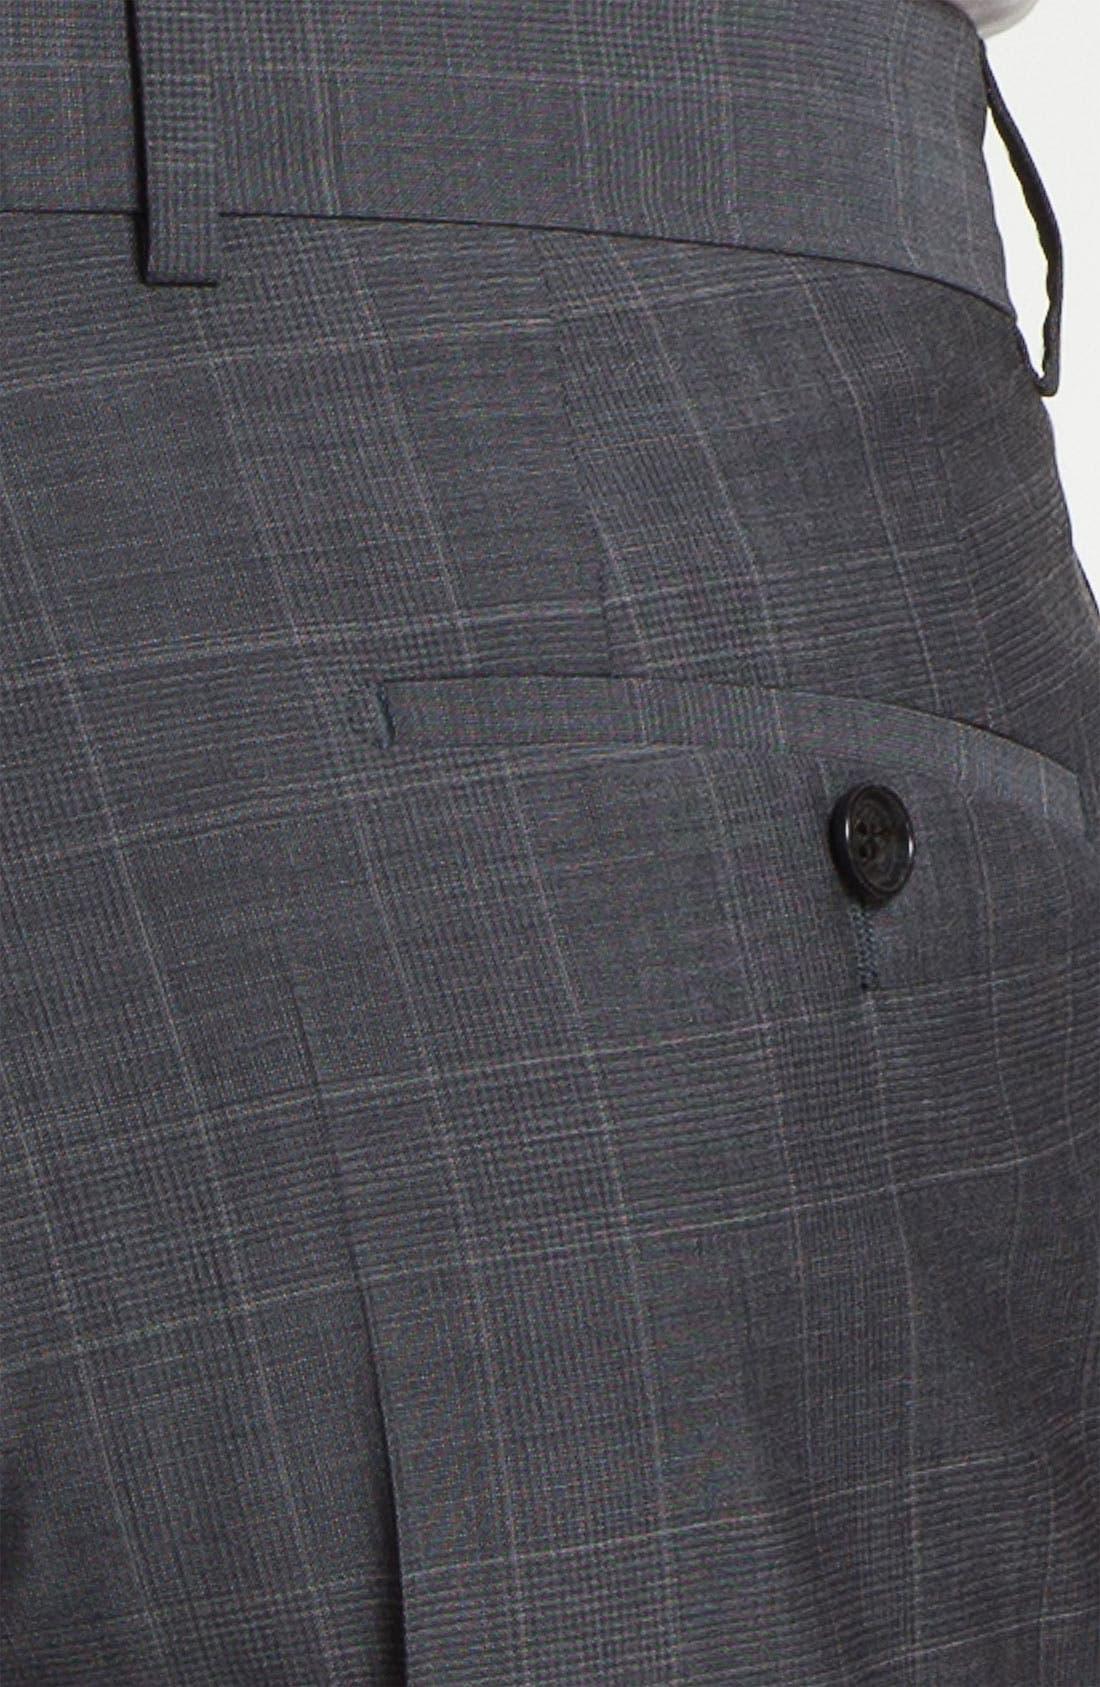 BOSS Black 'Pasini/Movie' Plaid Suit,                             Alternate thumbnail 2, color,                             030